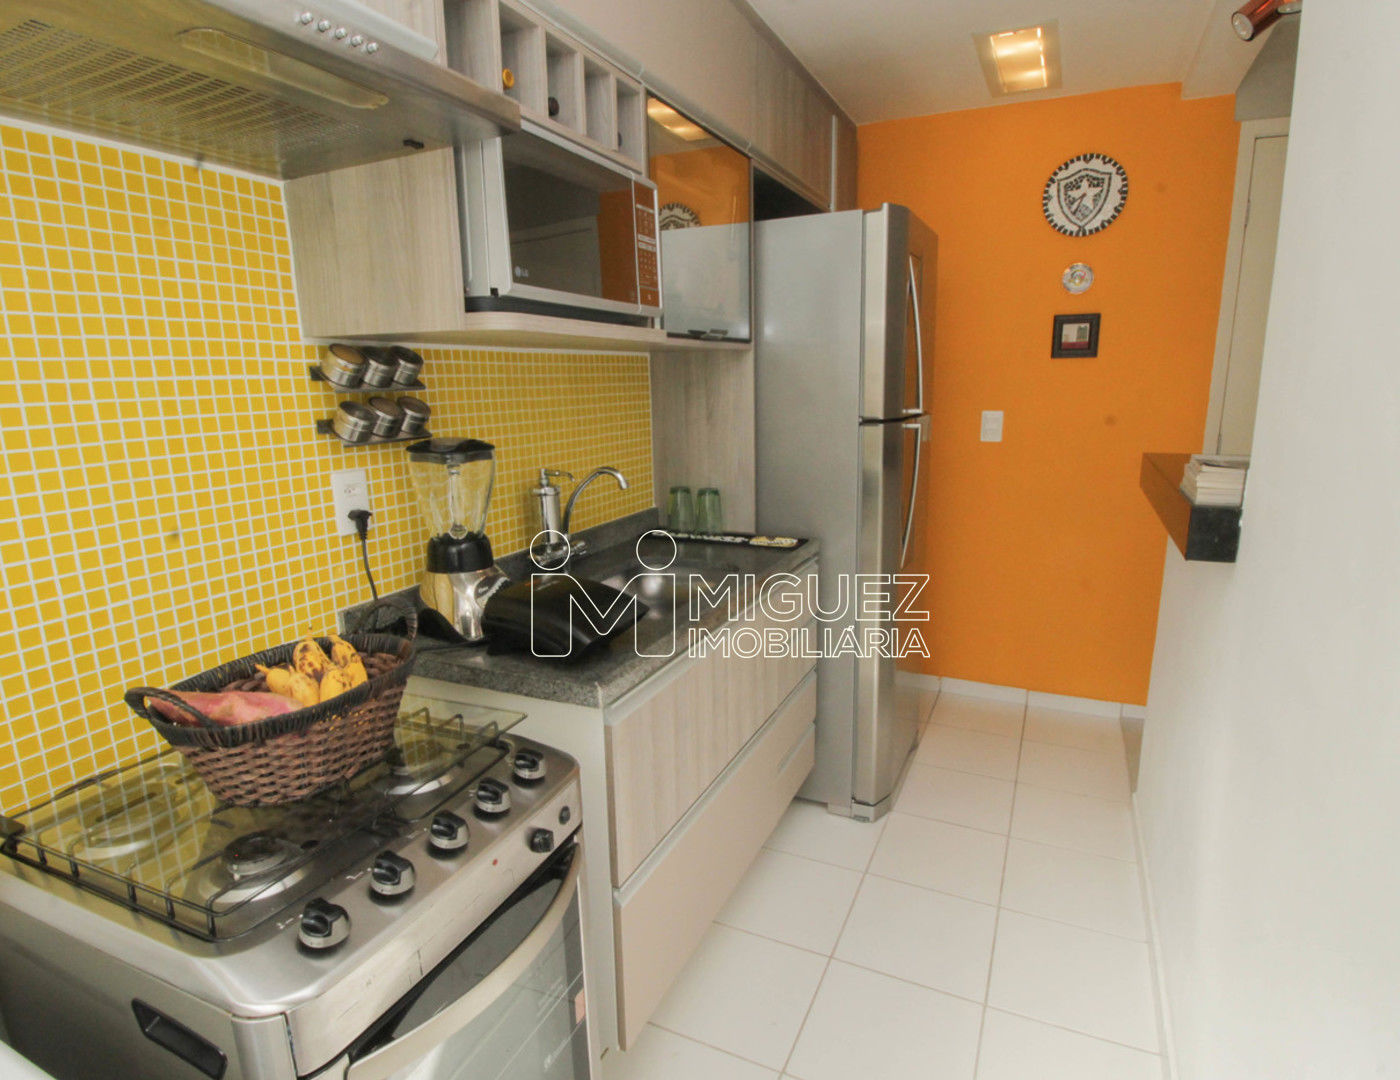 Apartamento, venda, Rua Aristides Lobo - Tijuca , Rio de janeiro